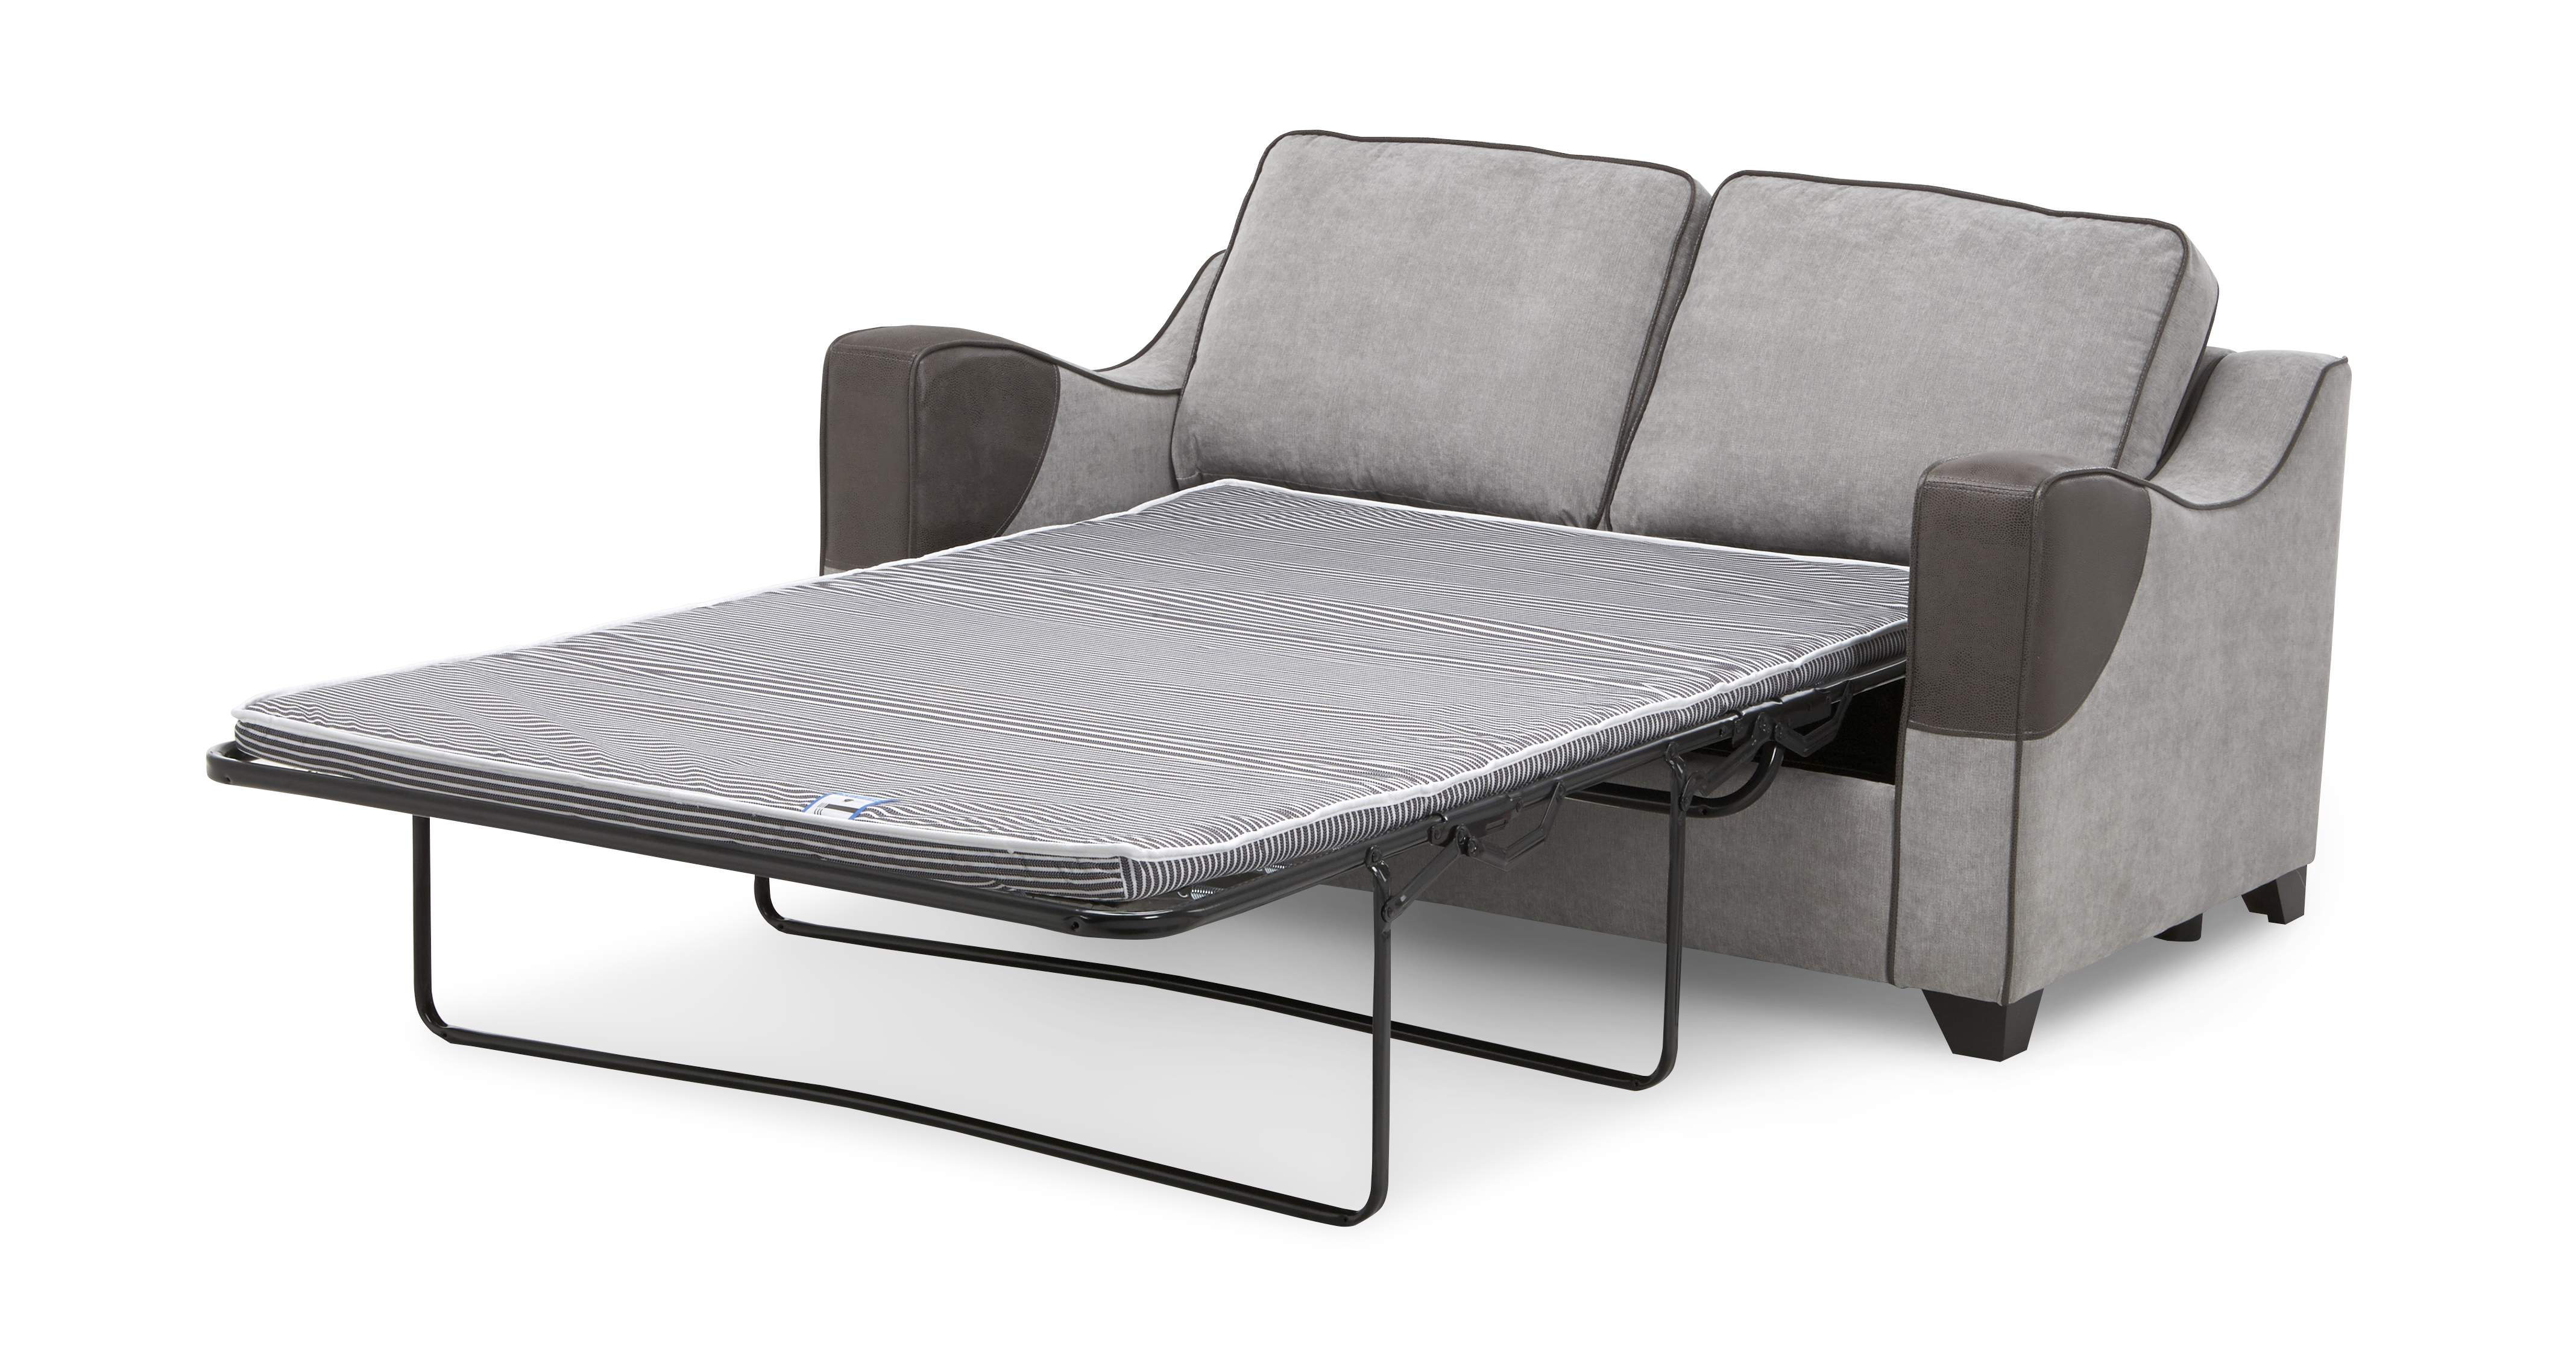 Dfs Kynda Set 2 Seater Sofa Bed Swivel Chair Half